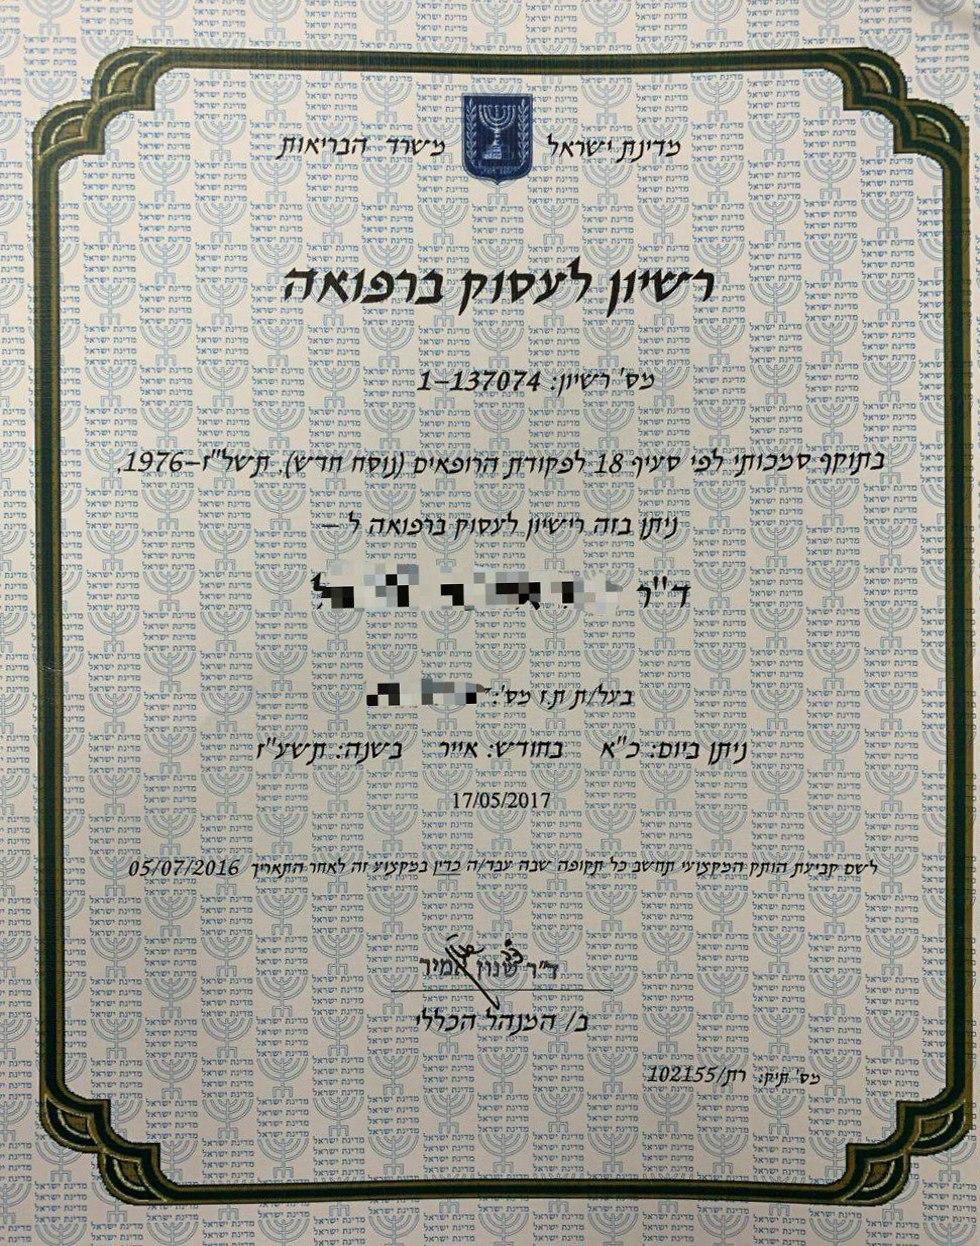 Разрешение на работу врачом в Израиле. Фото: пресс-служба полиции